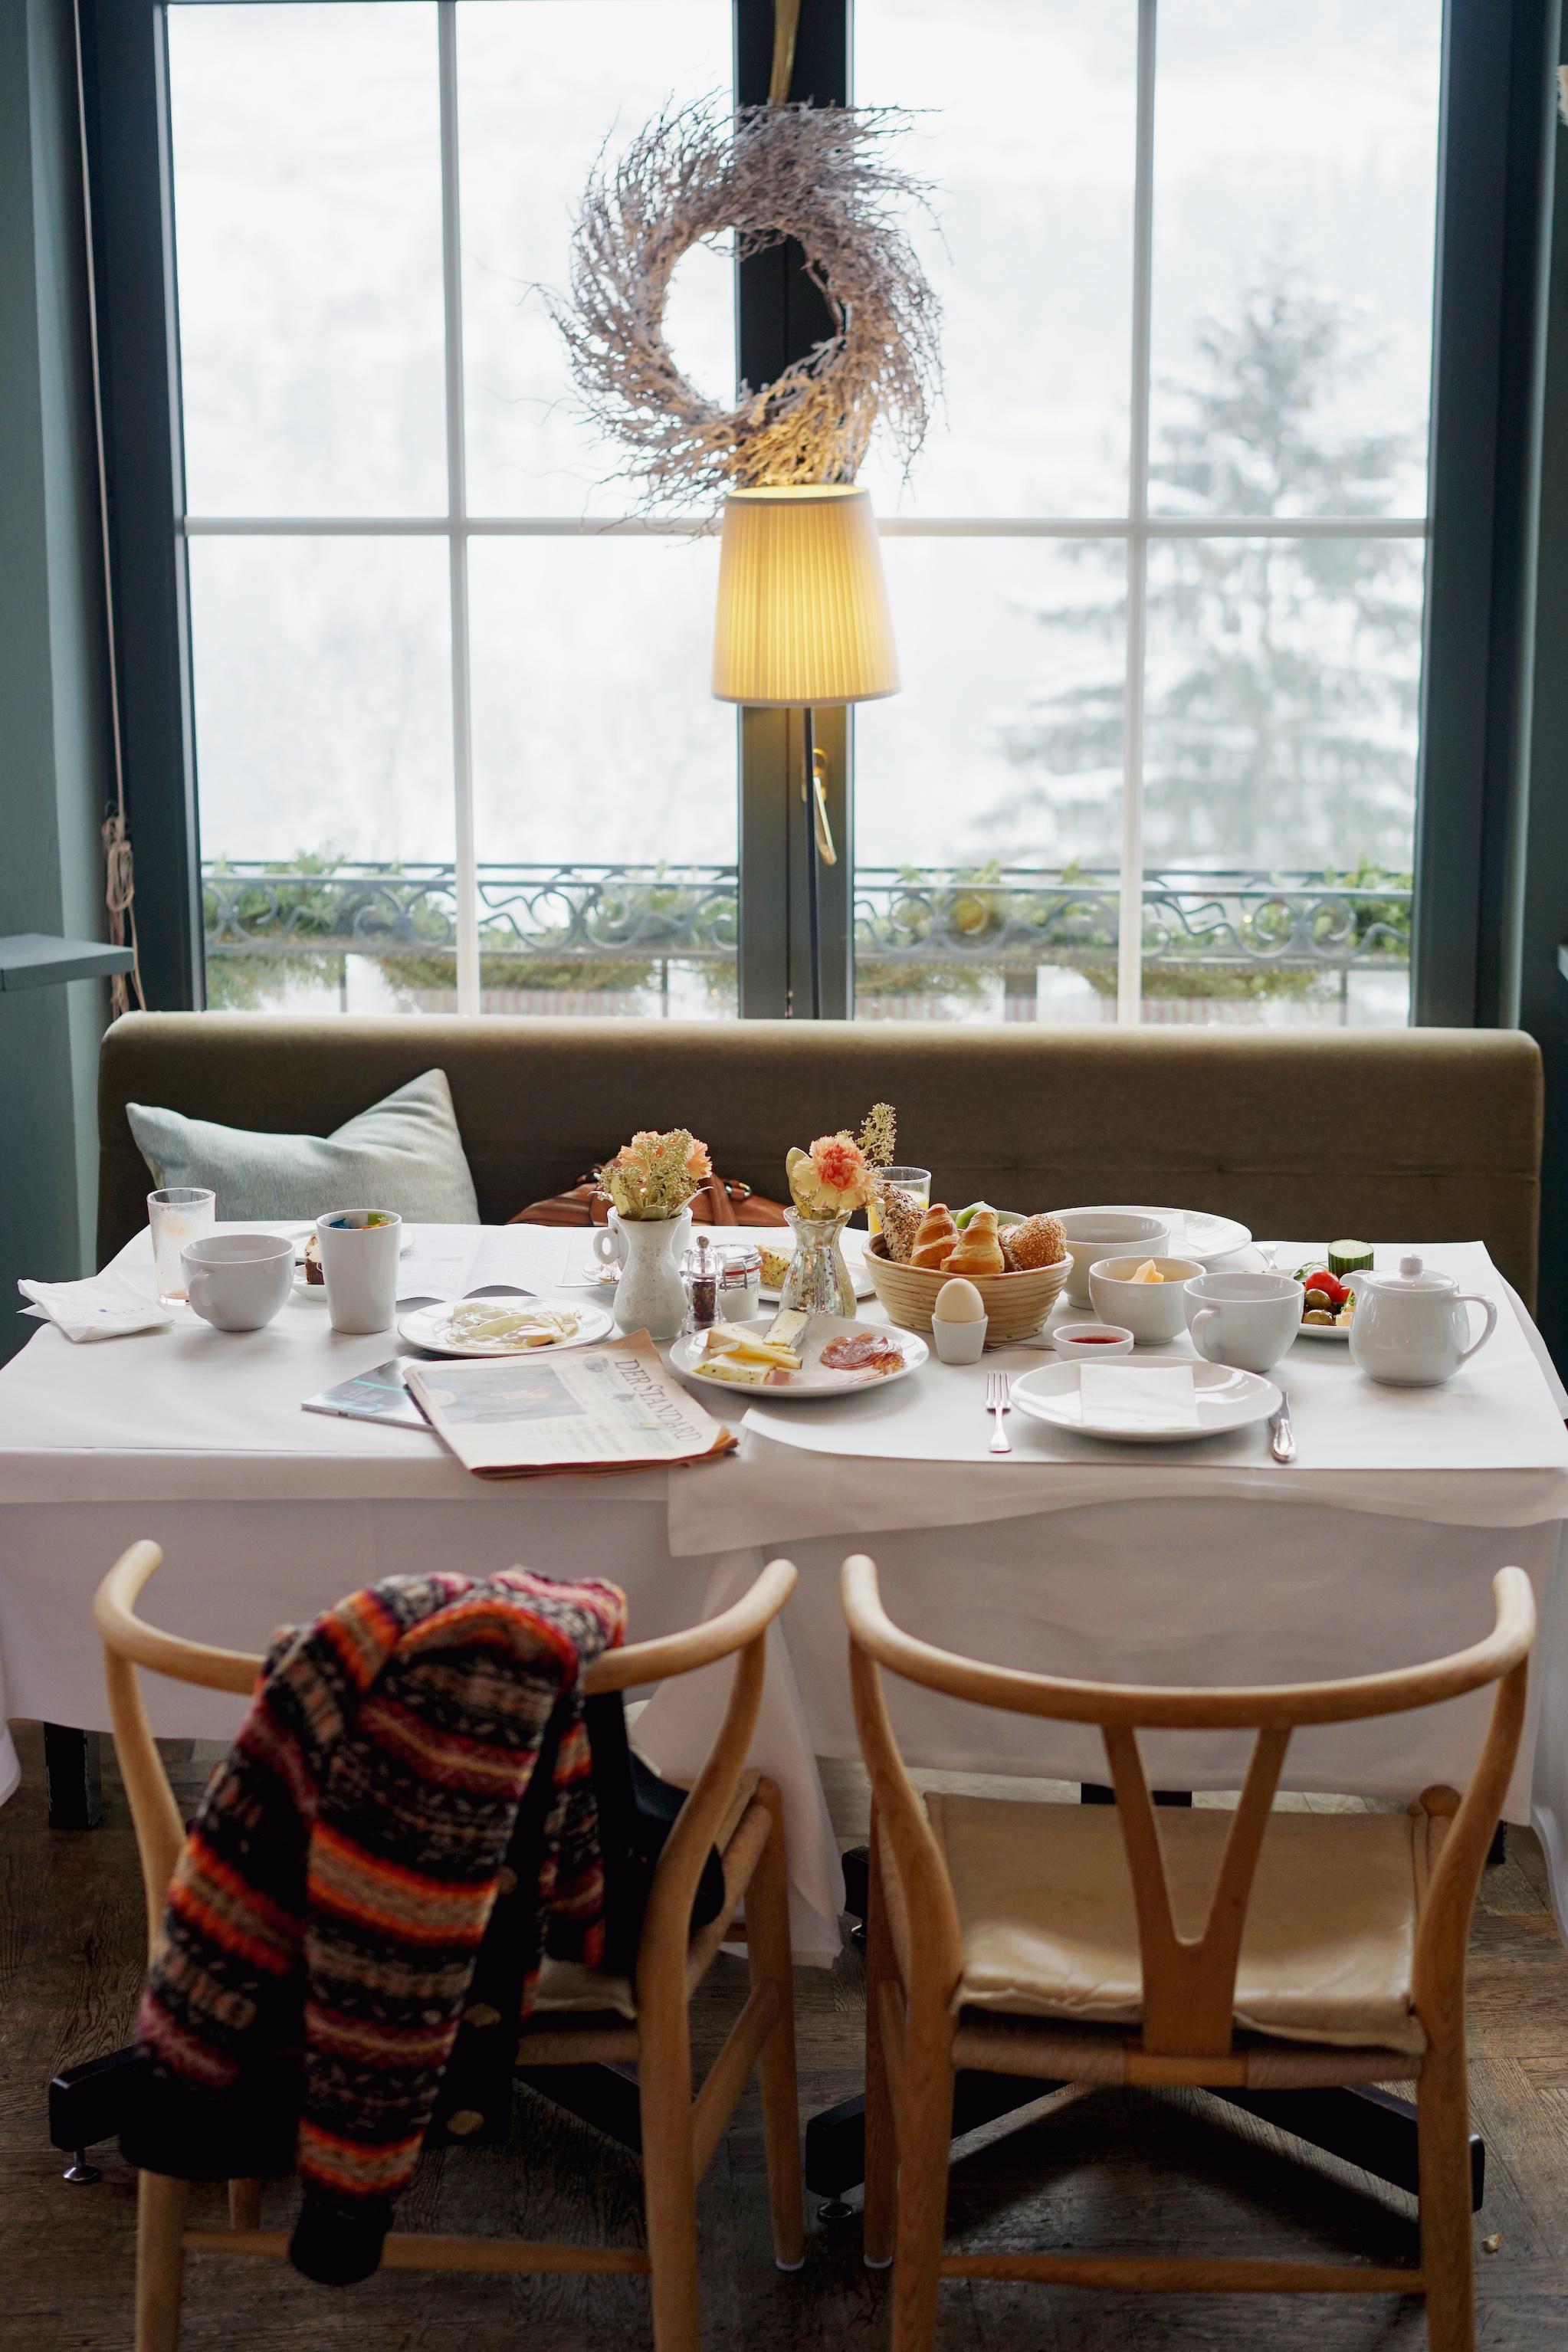 2017-04-Haus-Hirt - haus-hirt-bad-gastein-nectarandpulse-breakfast-59.jpg